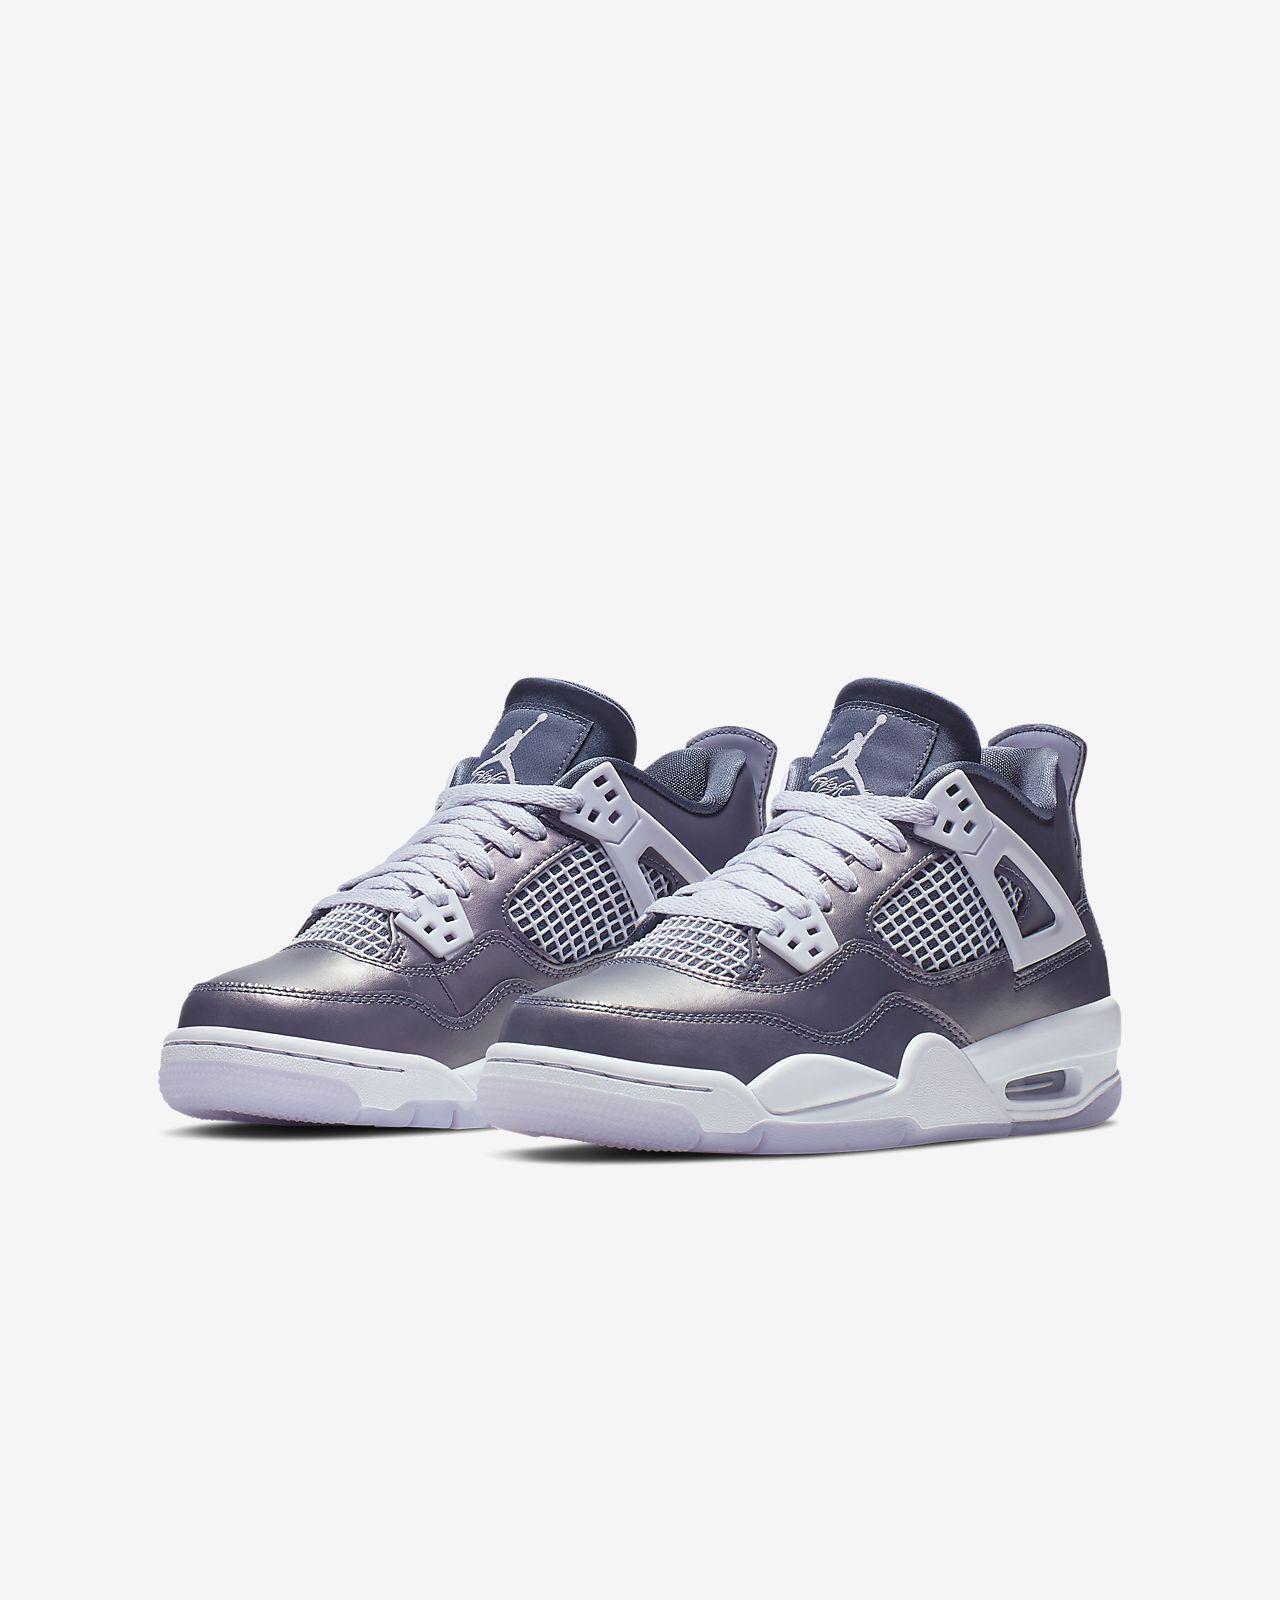 b7320189ddf42 Air Jordan 4 Retro SE Big Kids' Shoe. Nike.com